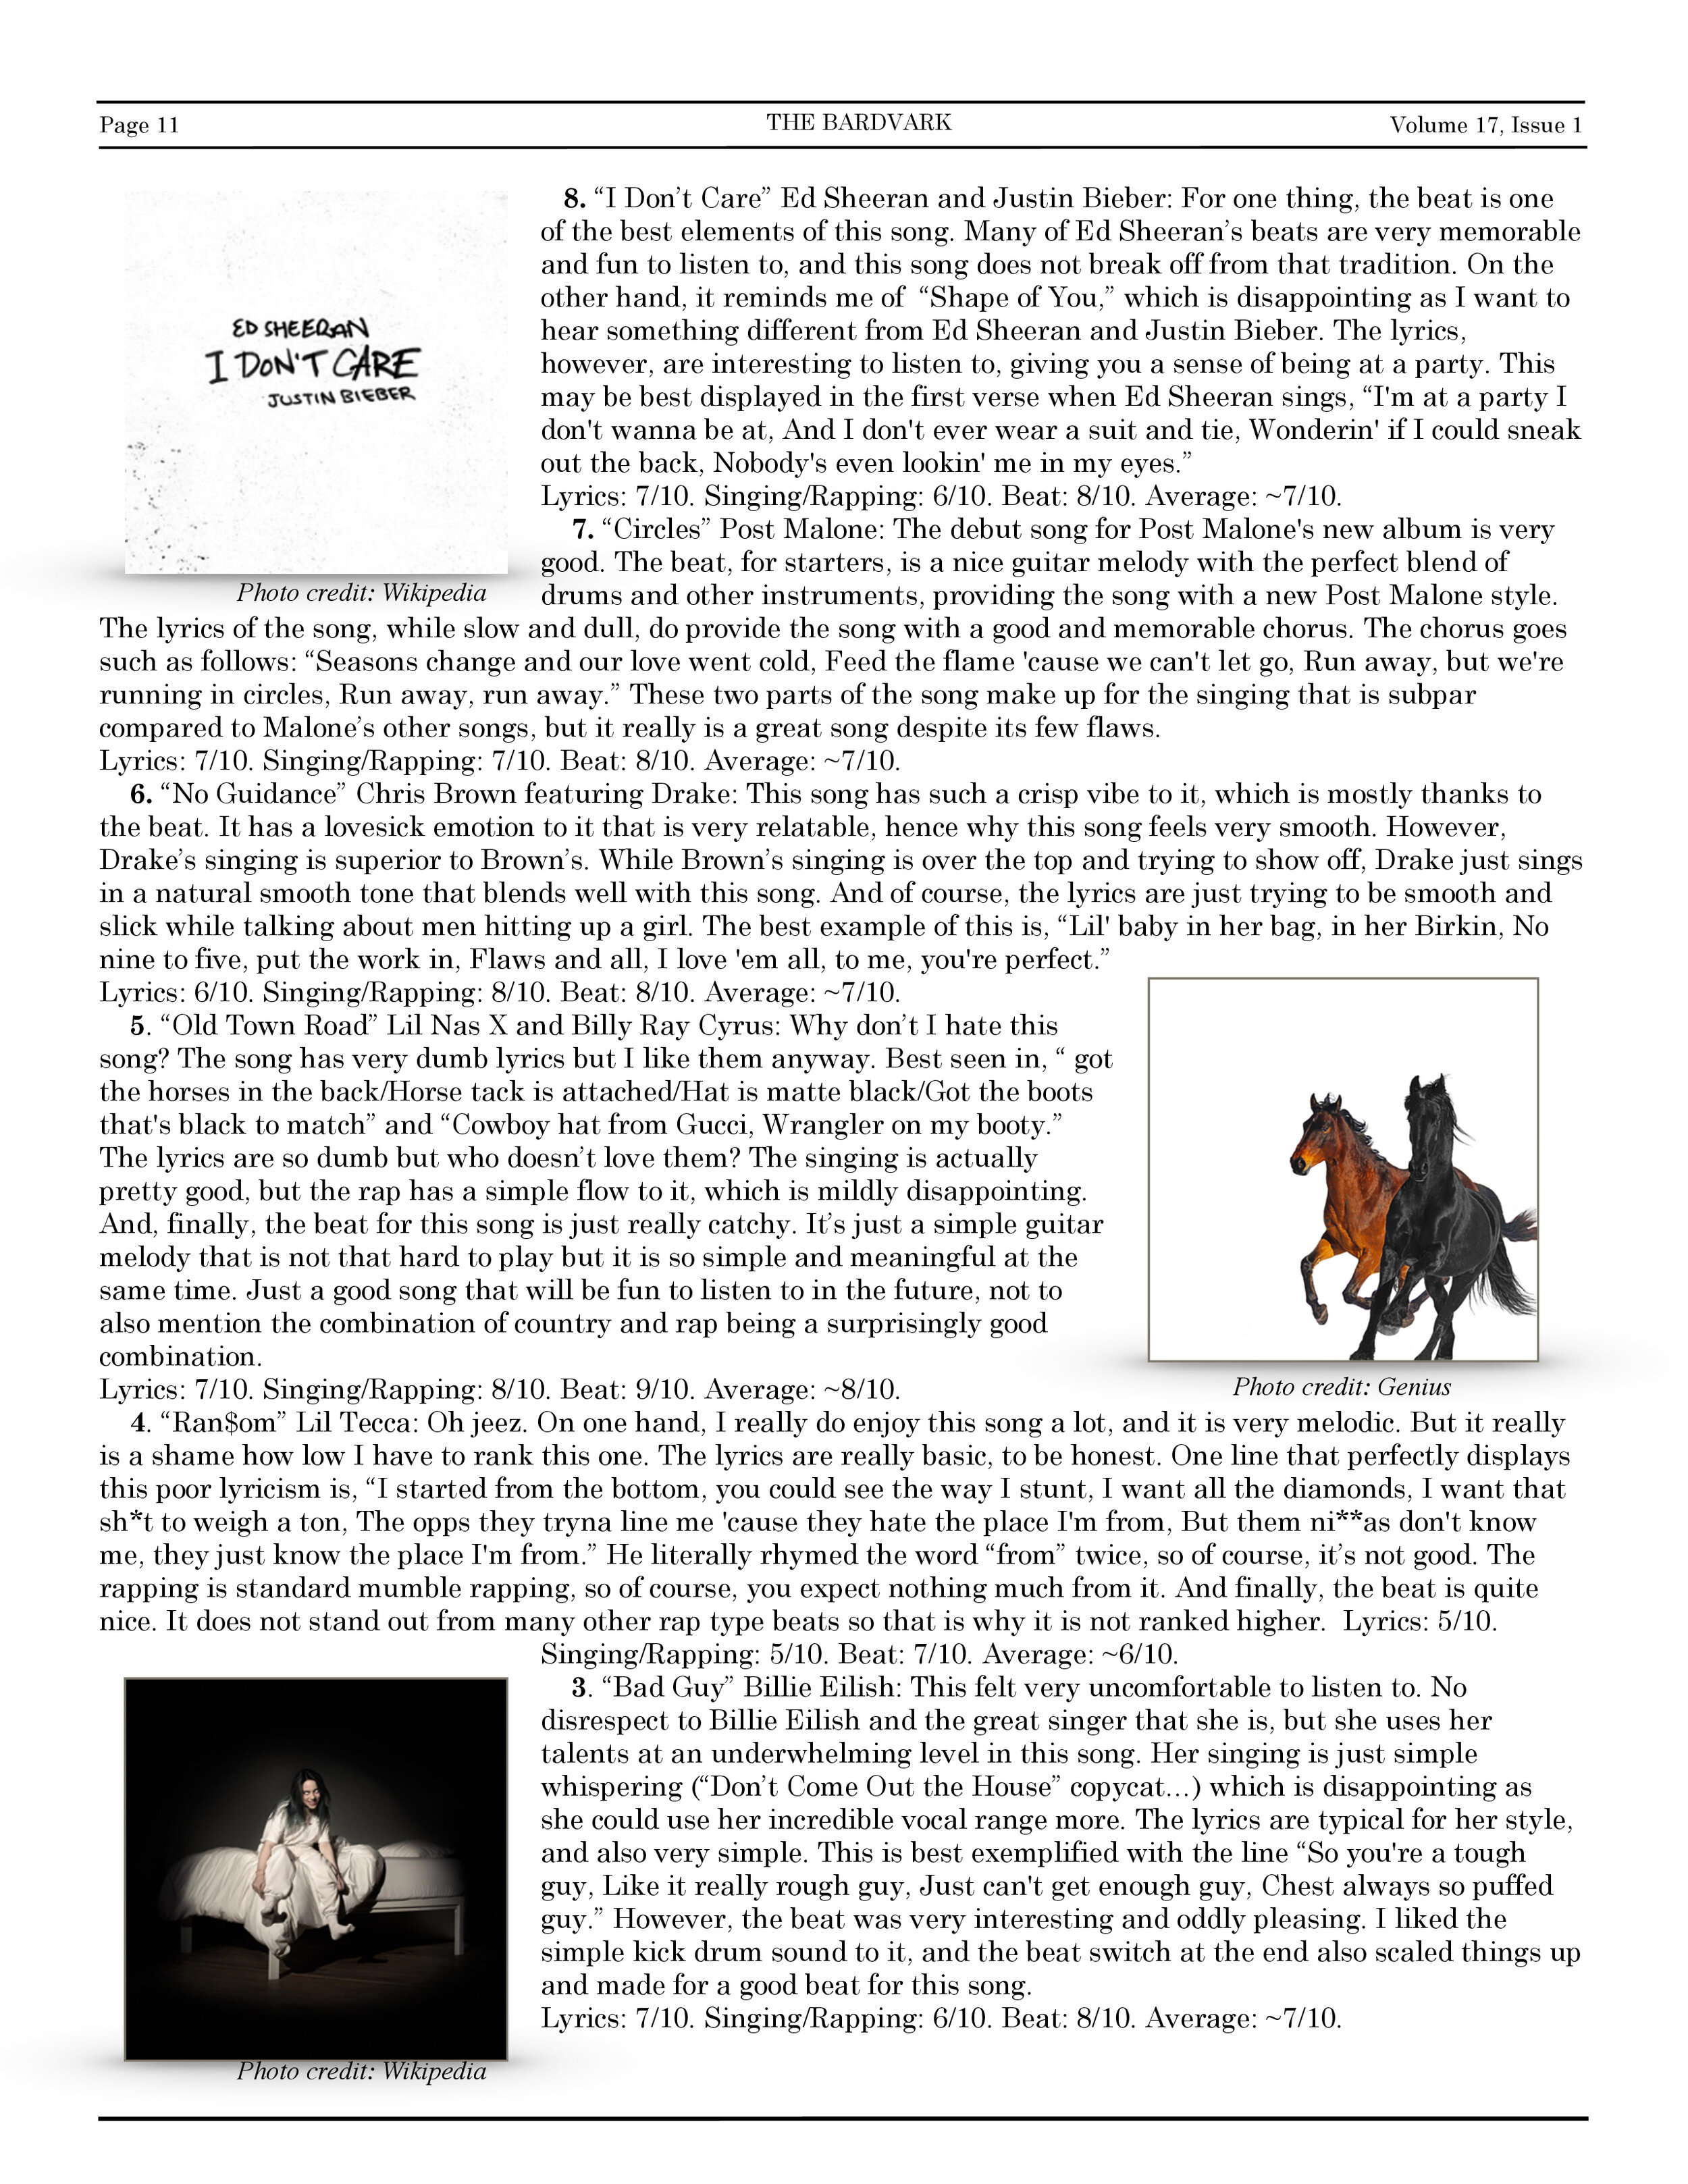 Bardvark Vol 17.1 2-11.jpg